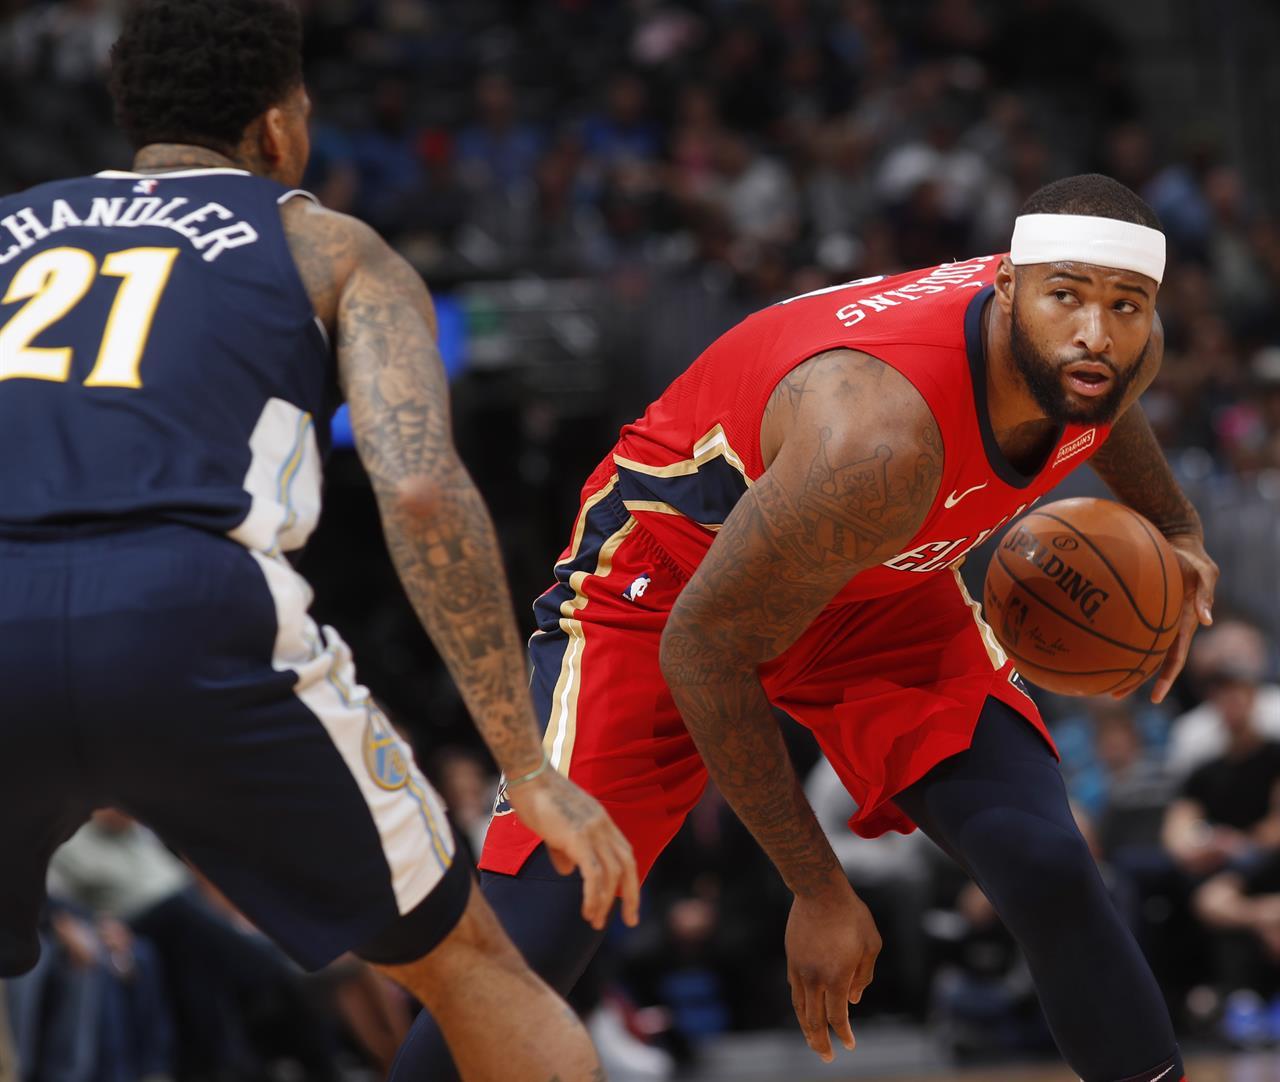 Barton Leads Nuggets Past Pelicans 117-111 In OT